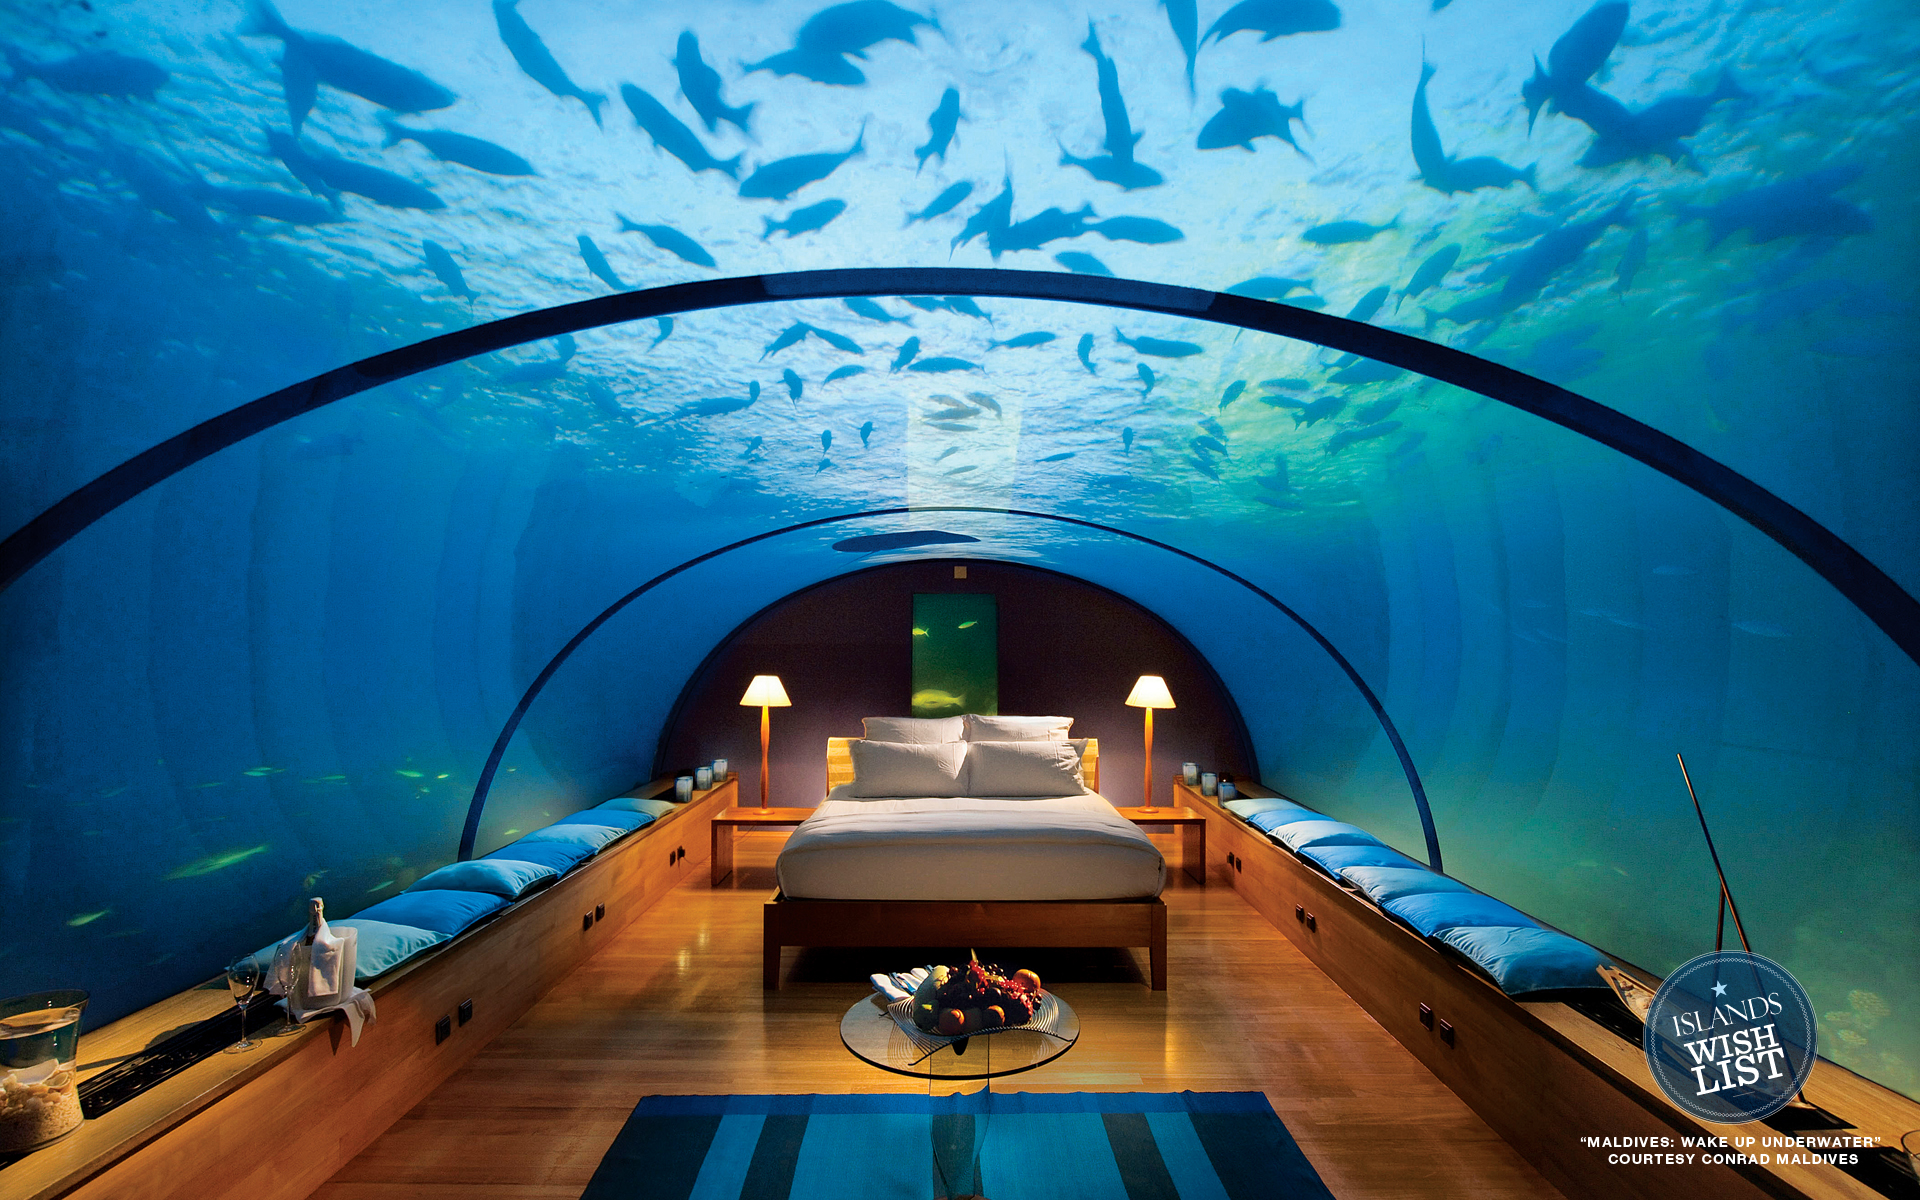 Maldive Islands Resort Pictures   Best Wallpapers Fan Download Free ...